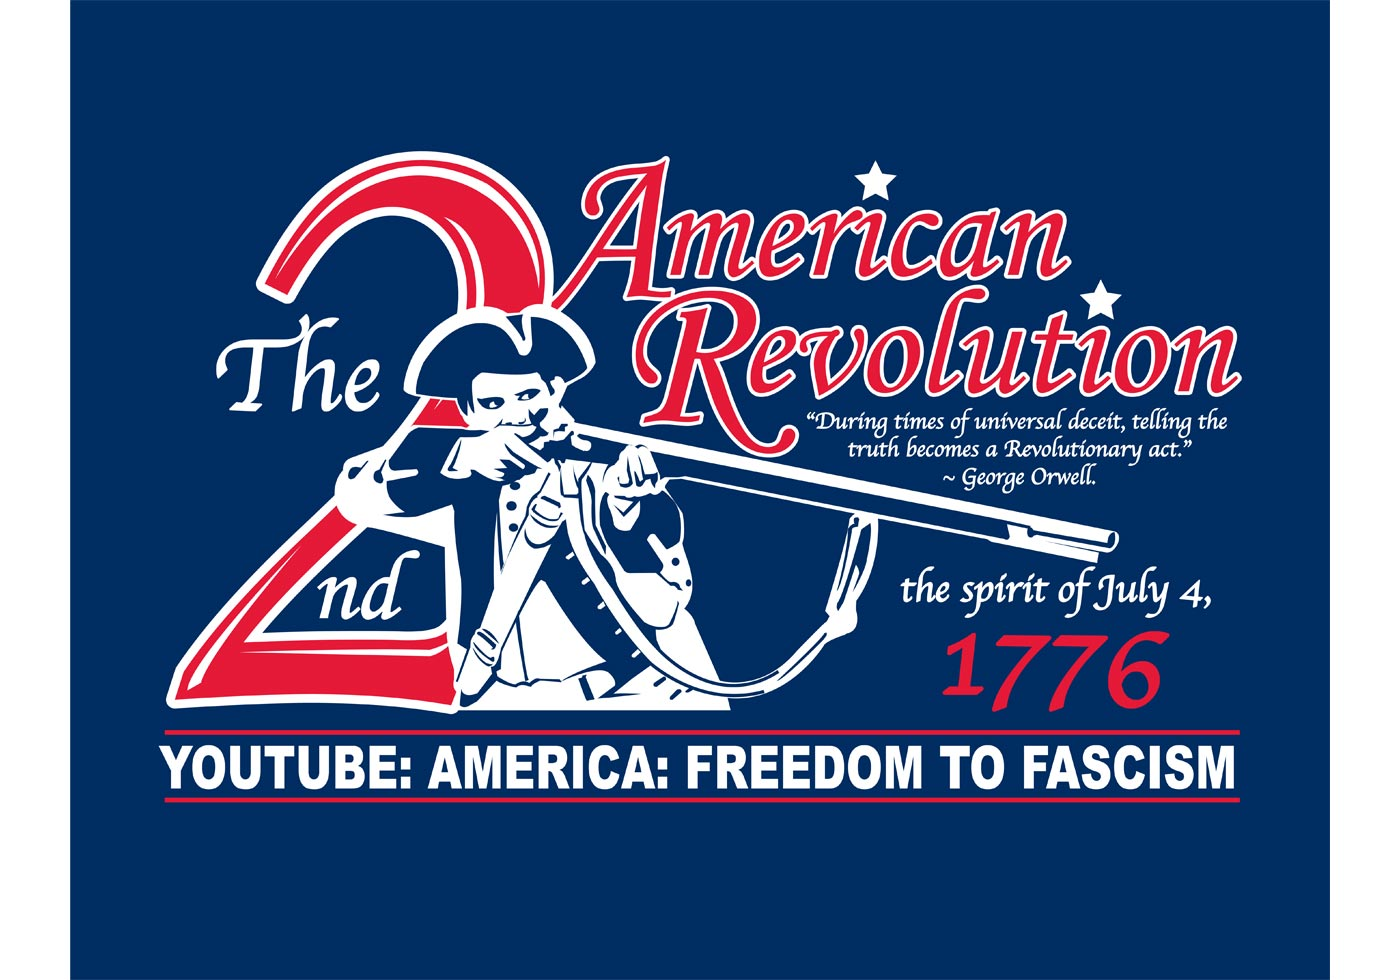 2nd American Revolution Download Free Vector Art Stock